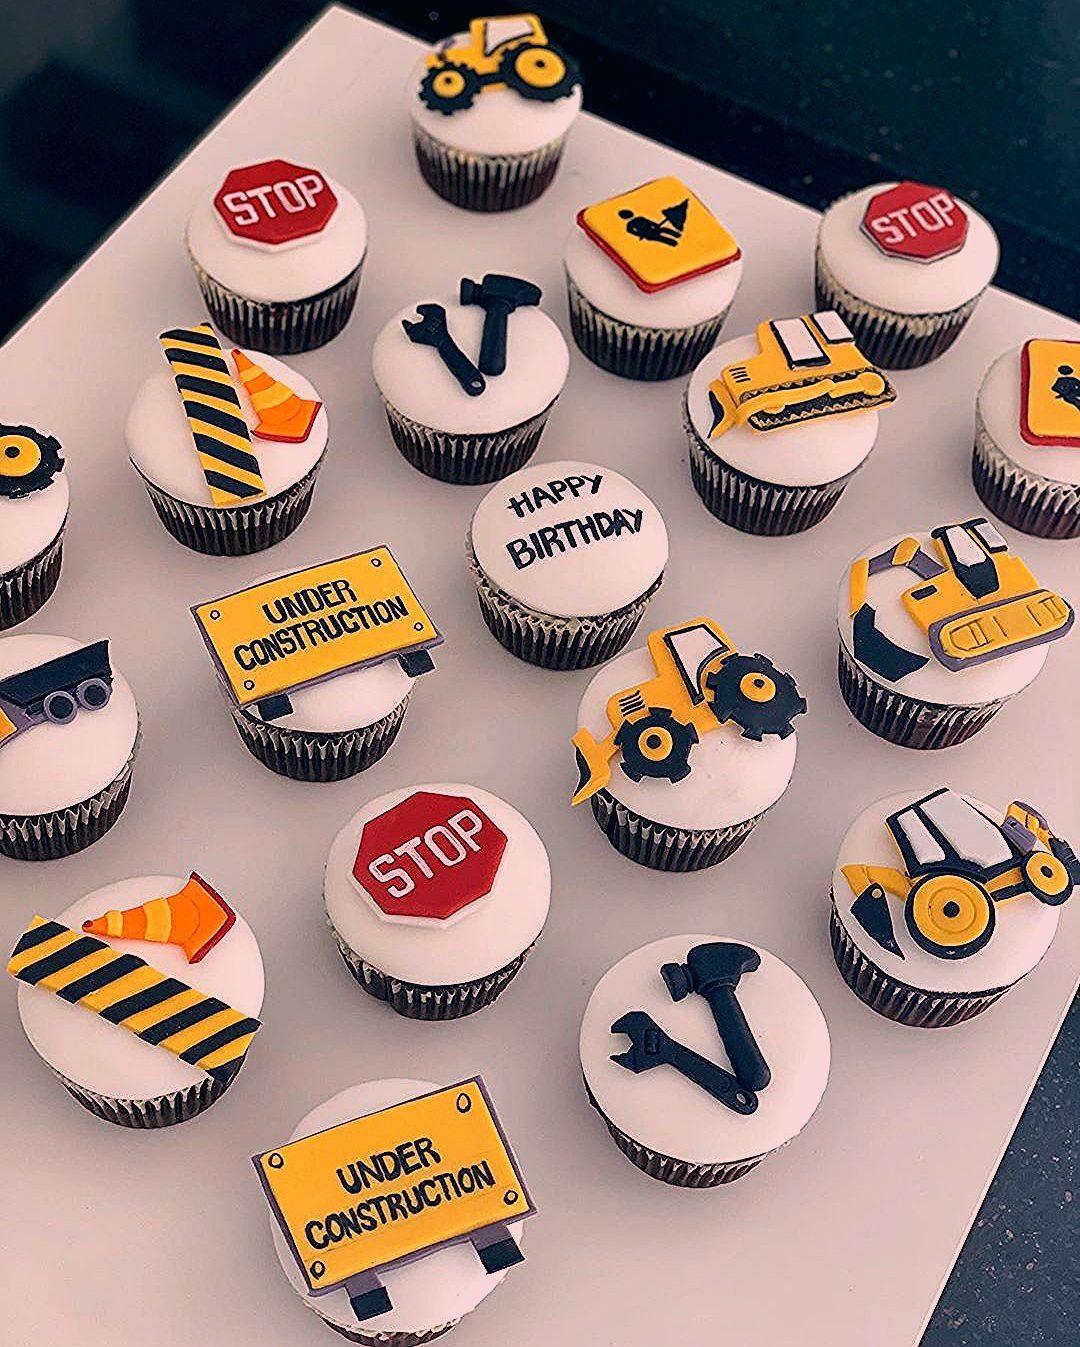 Construction Cupcakes Construction Themed Party Customized Cakes In Abu Dhabi كيك عيد ميلاد للاولاد كيك مهندس تخر Construction Birthday Food Birthday